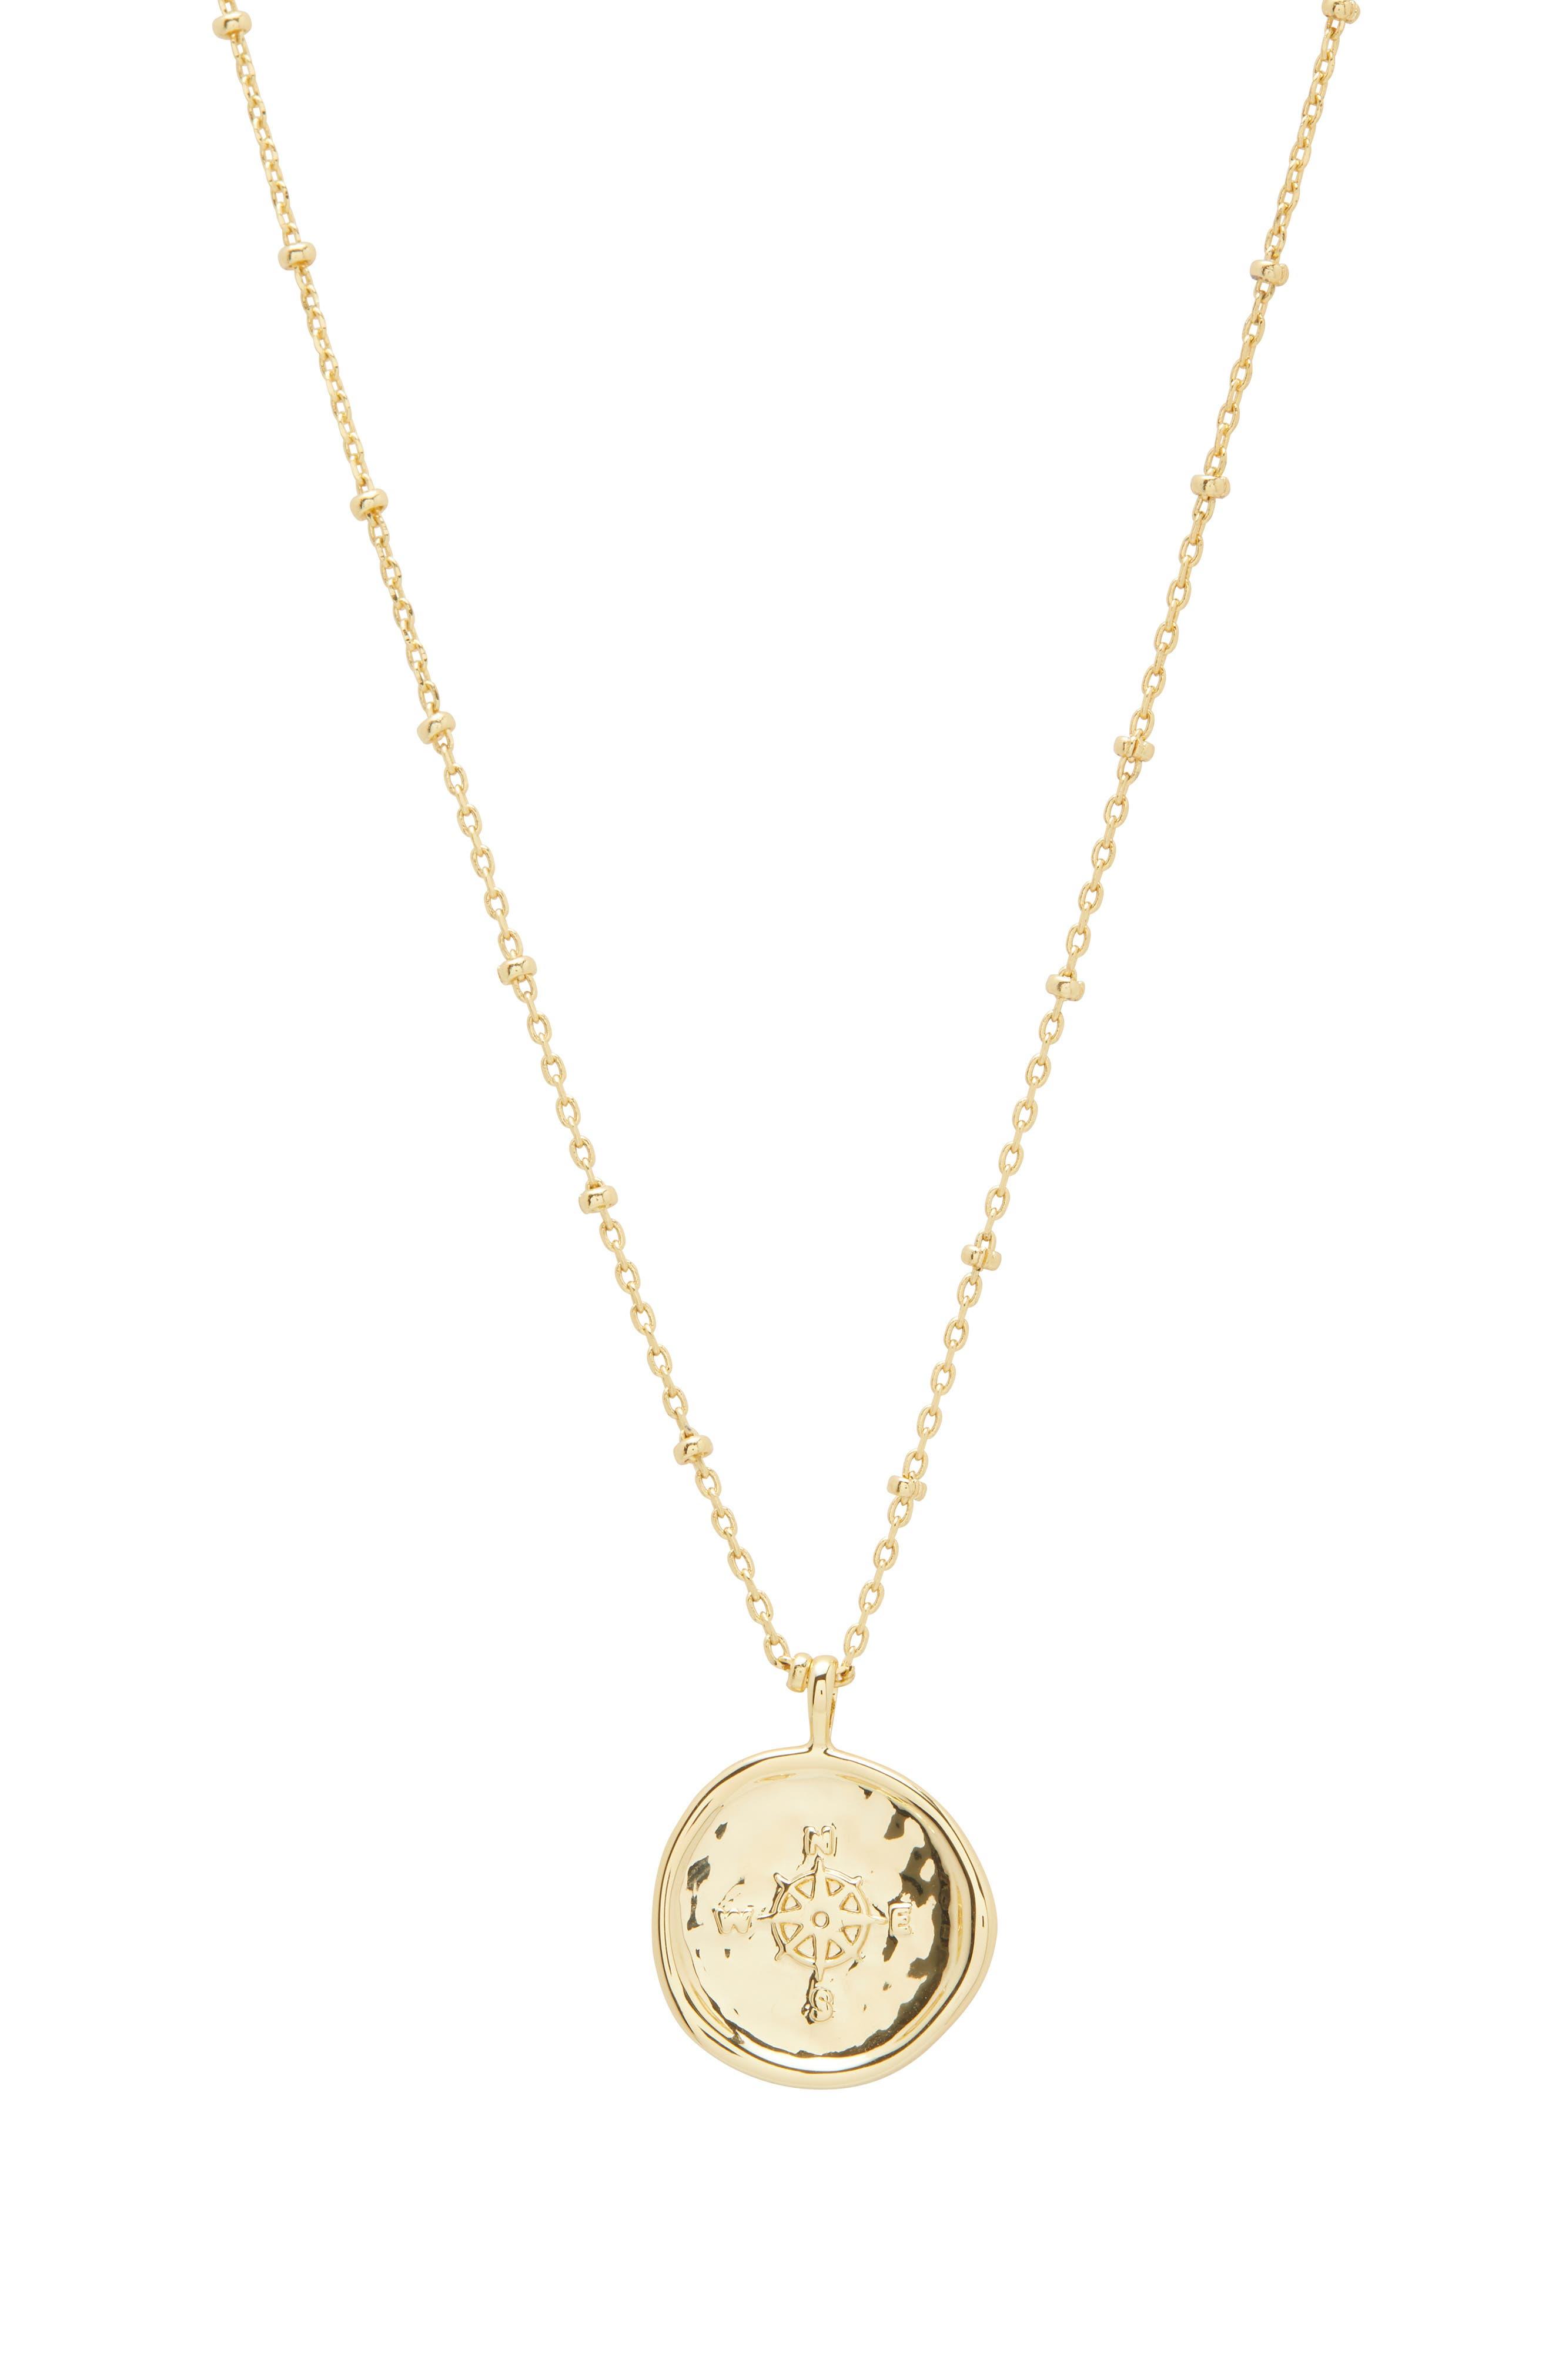 Compass Coin Pendant Necklace